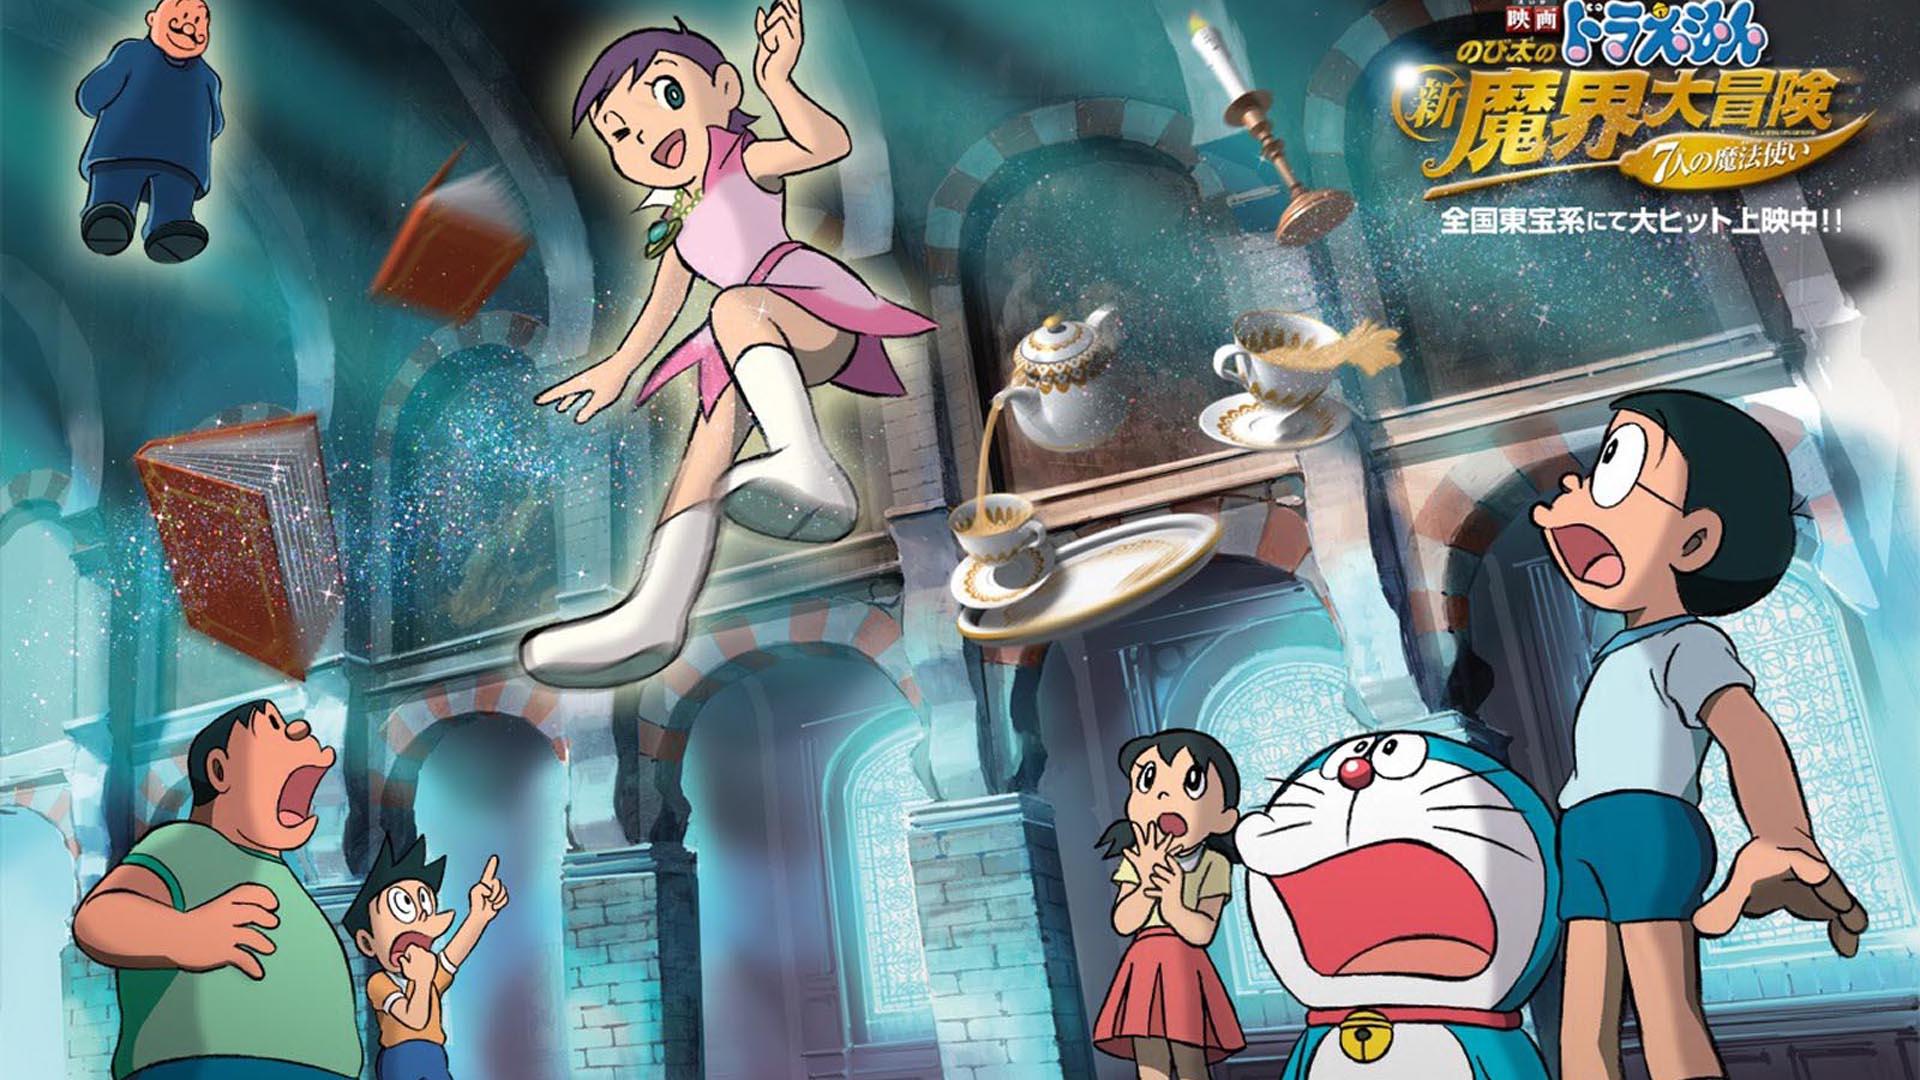 Doraemon Movie Wallpapers Wallpaper Cave